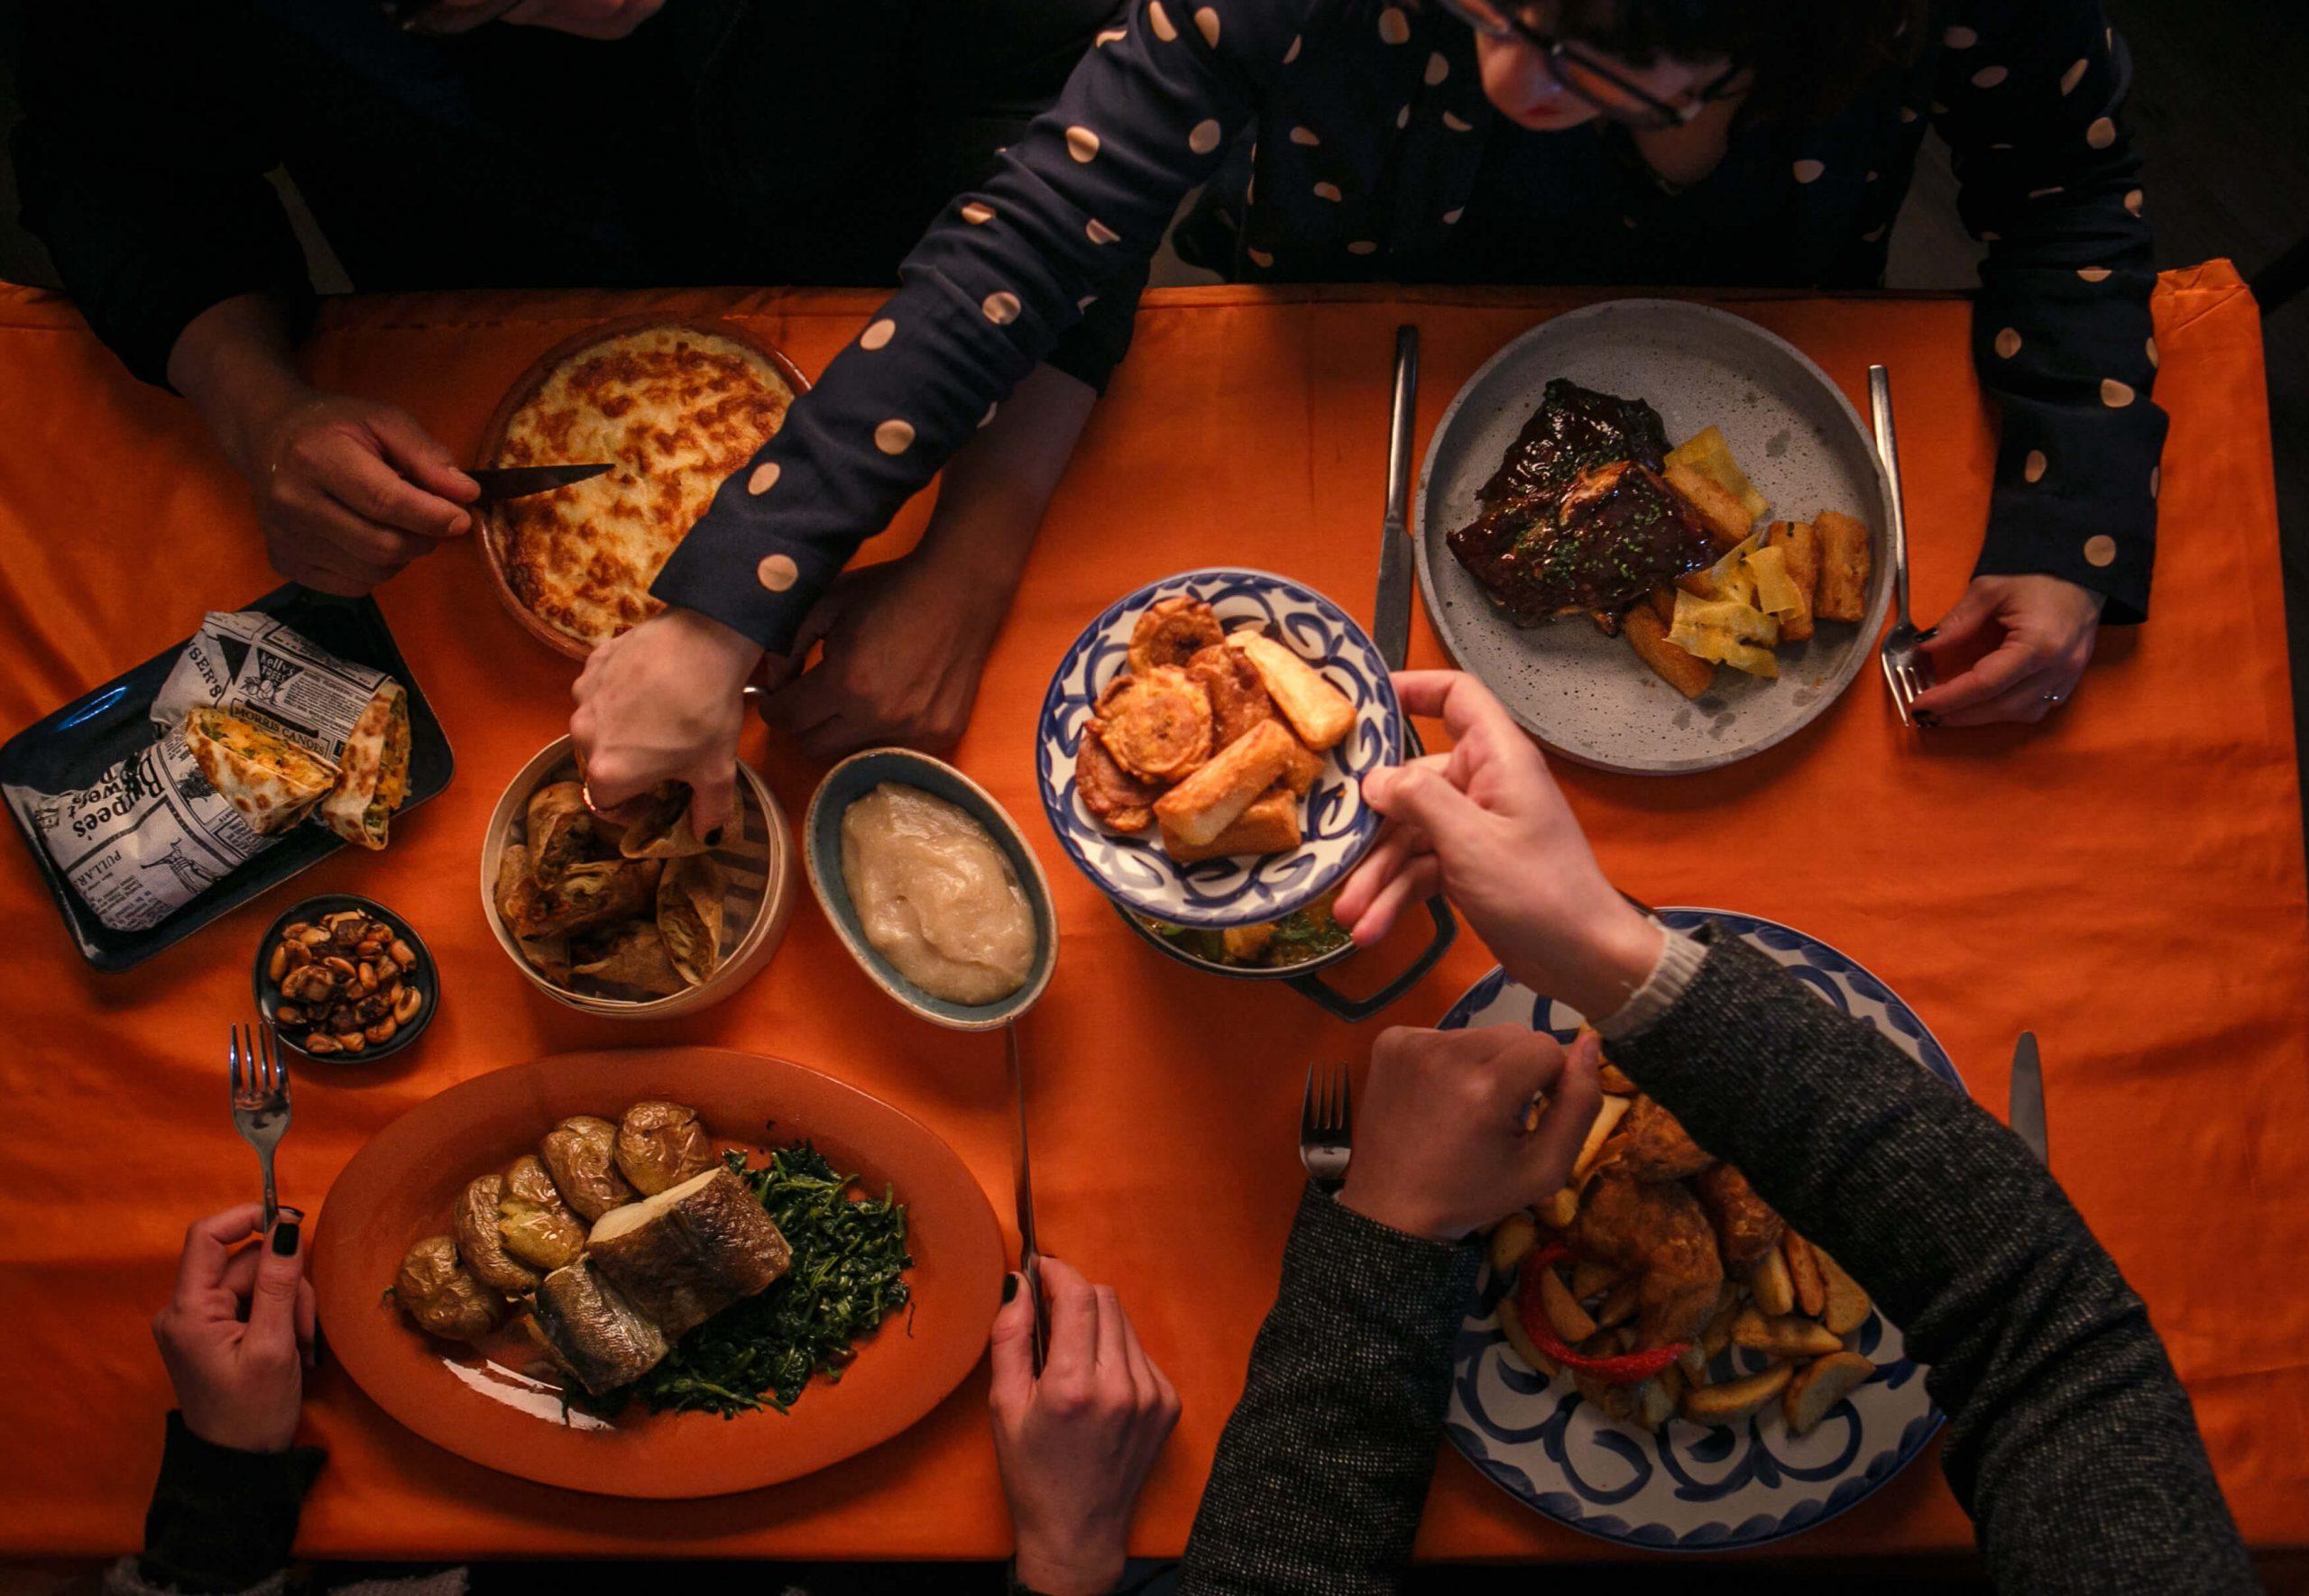 World of food - MAD-295